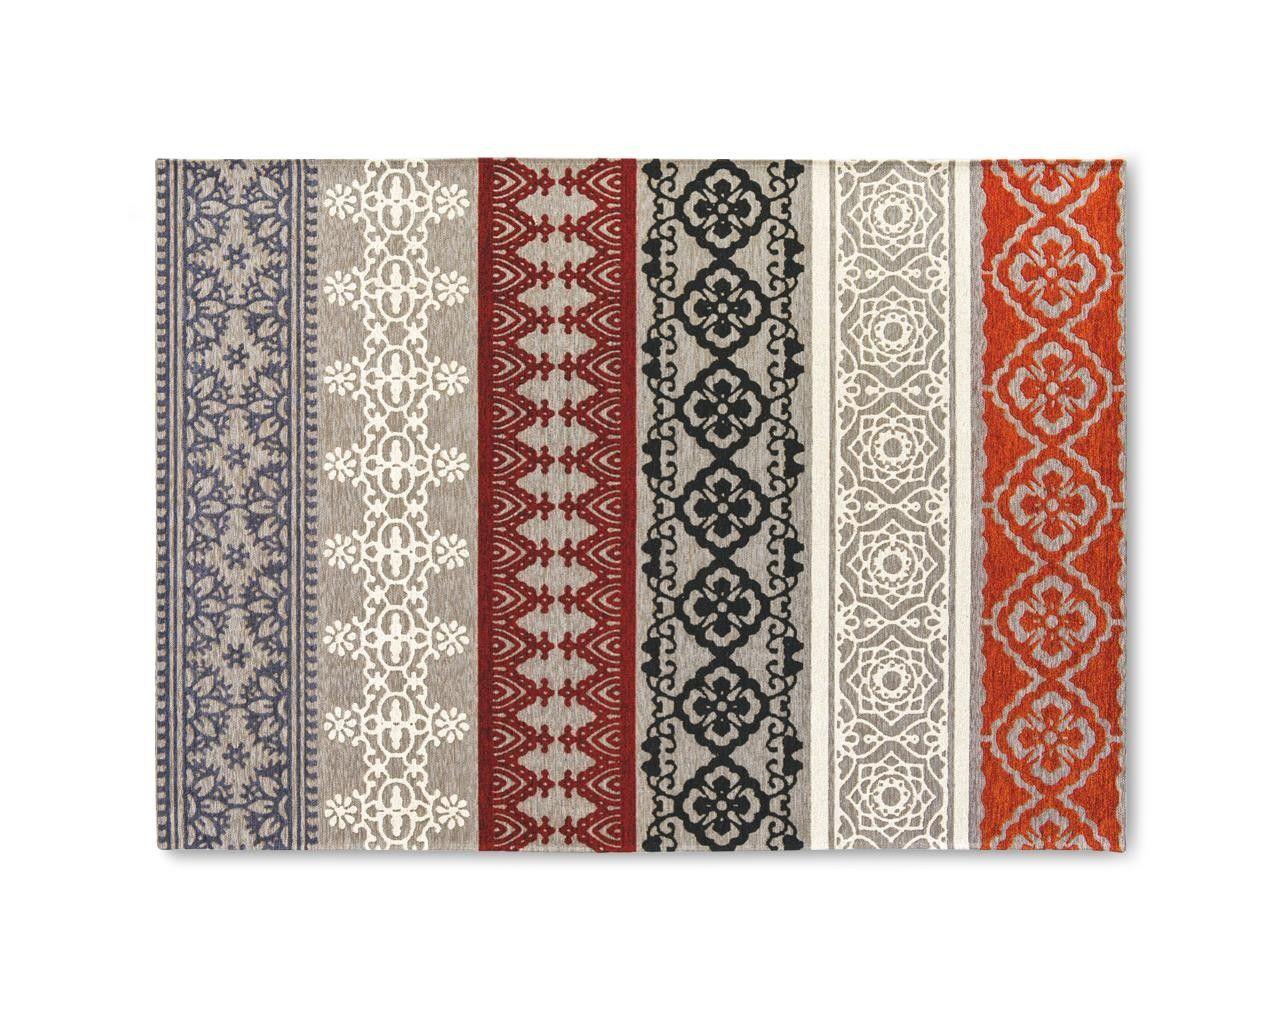 Calligaris Nadira Middle Eastern Decorated Rug Middle Eastern Rug Nadira Calligaris Traditional Rugs Rugs